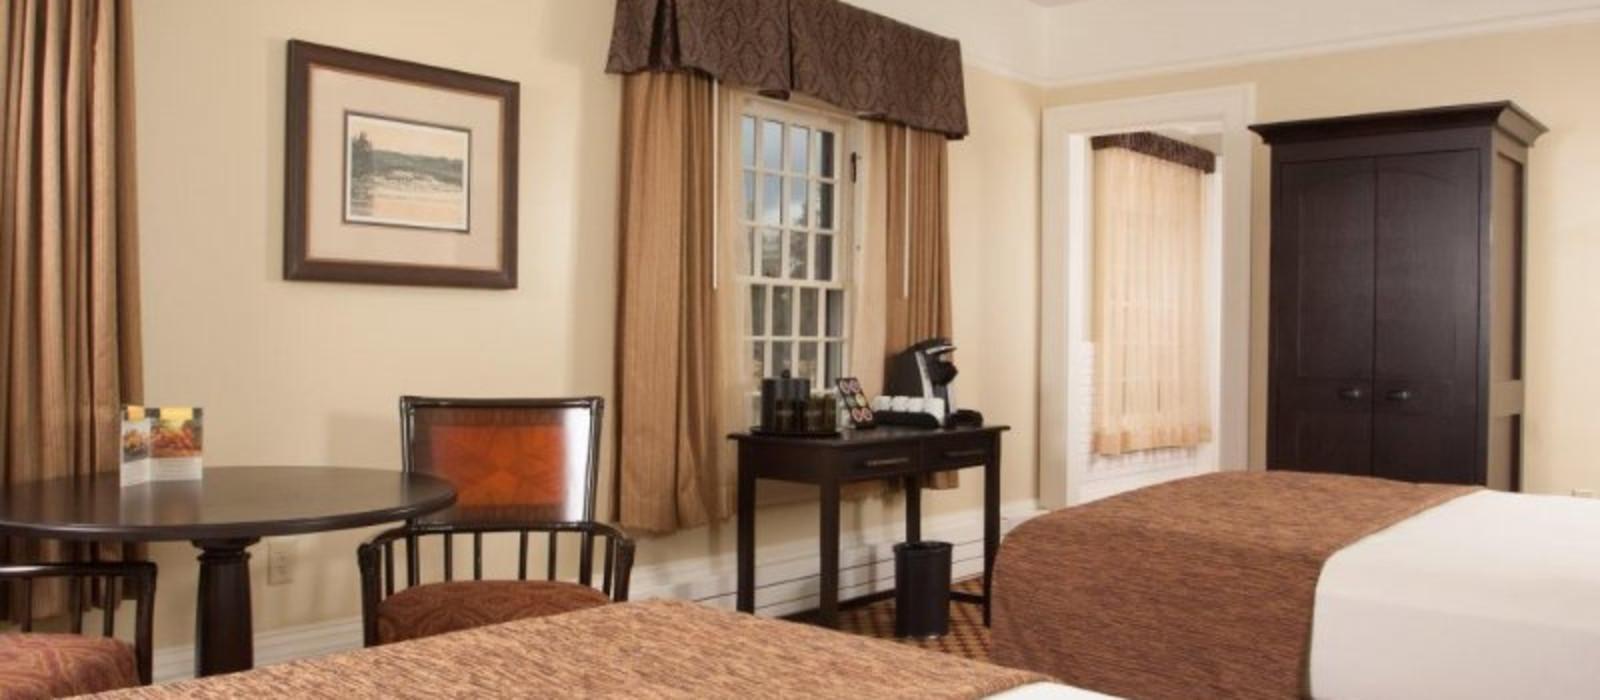 Hotel Lake Yellowstone  and Cabins USA